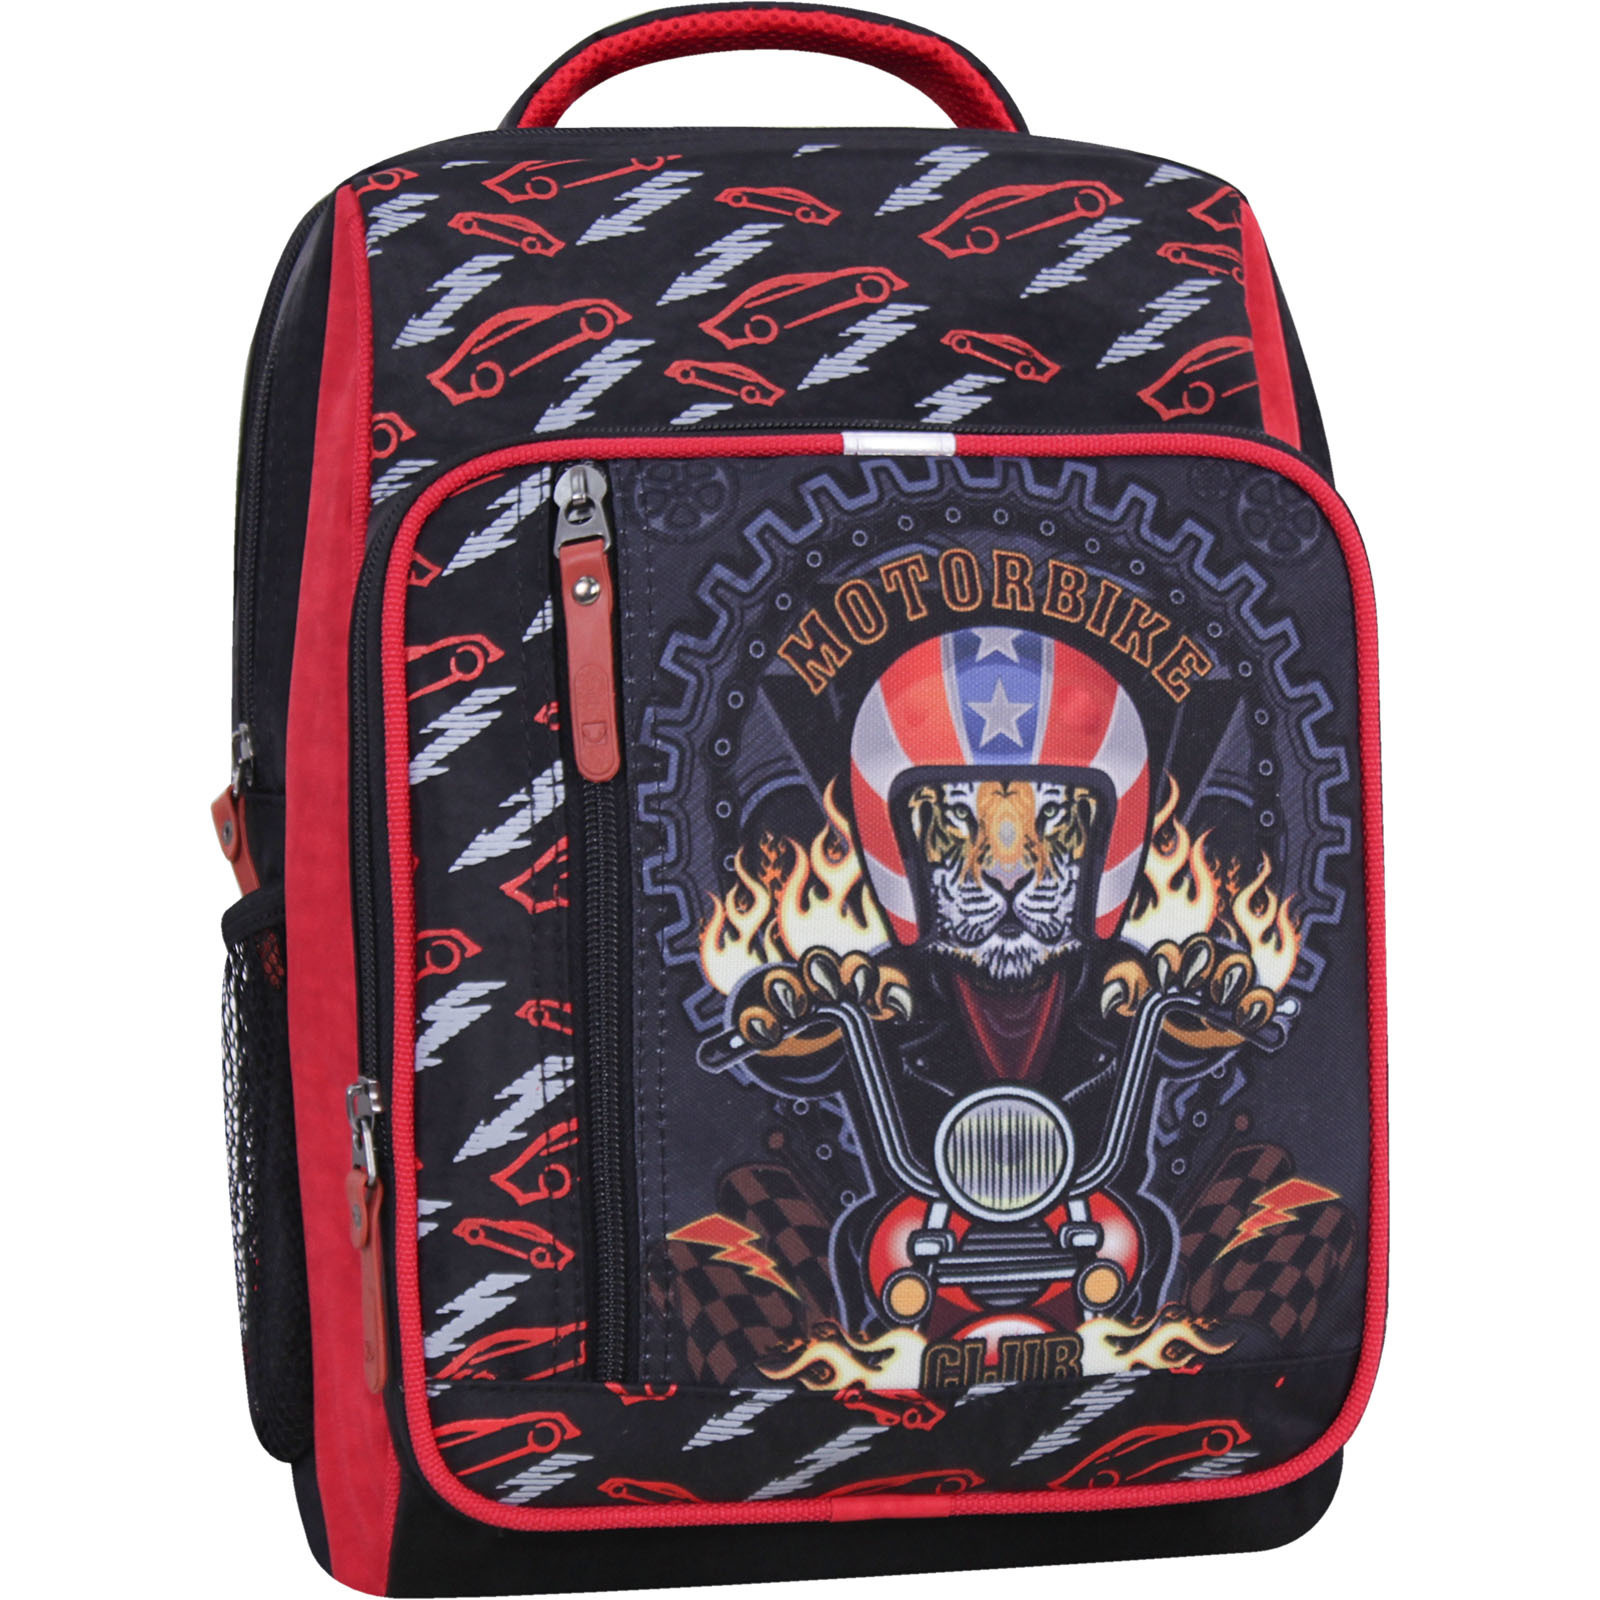 Школьные рюкзаки Рюкзак школьный Bagland Школьник 8 л. черный 658 (0012870) IMG_2704_суб.658_-1600.jpg